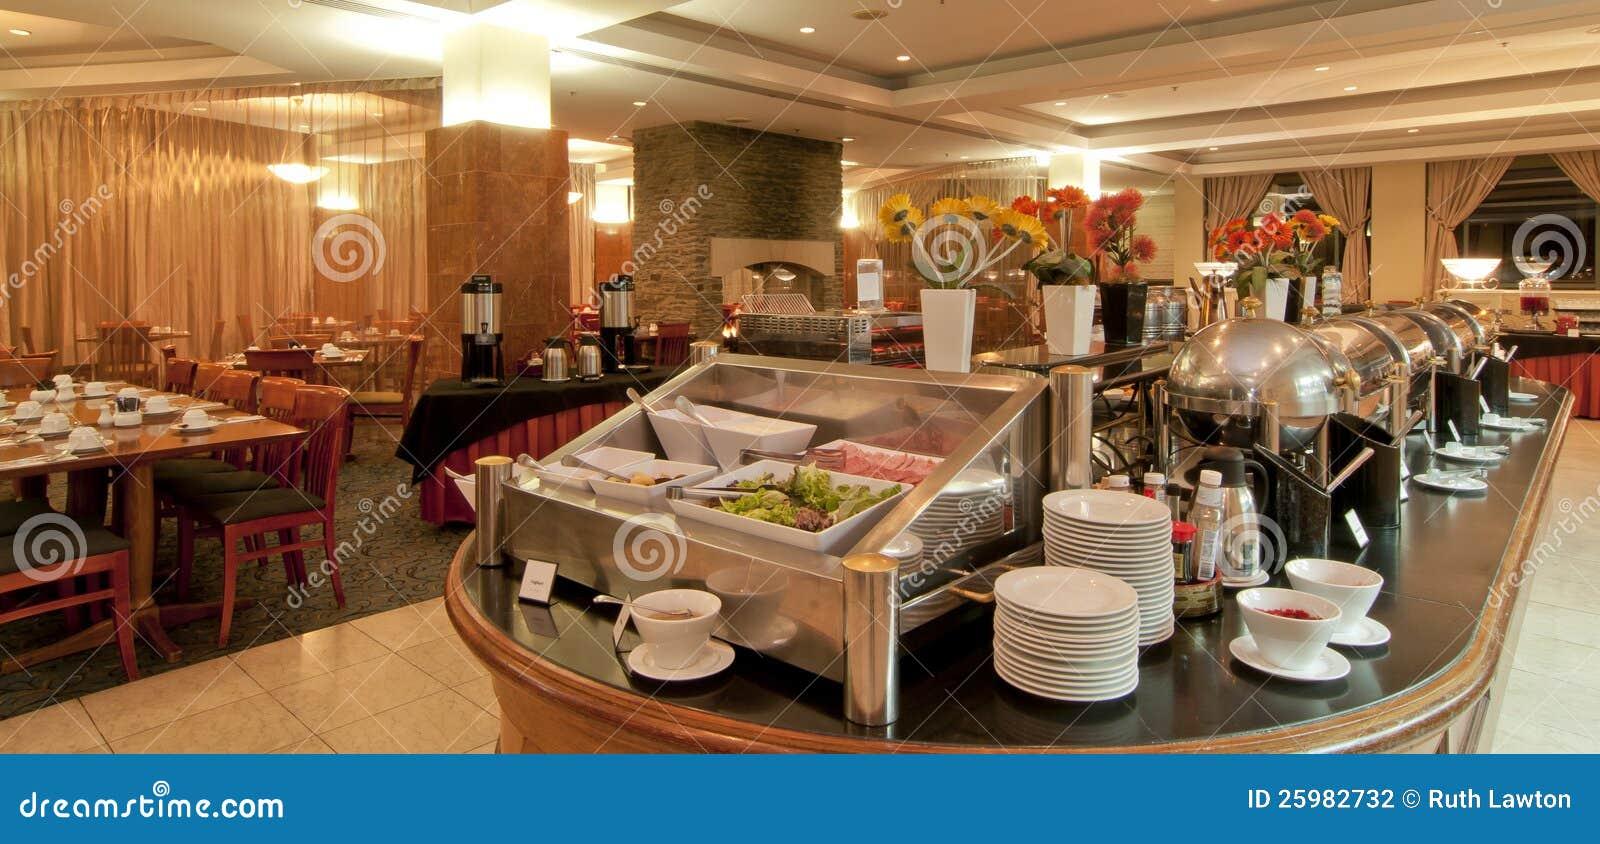 Hotel Breakfast Buffet Stock Photo Image Of Elegant